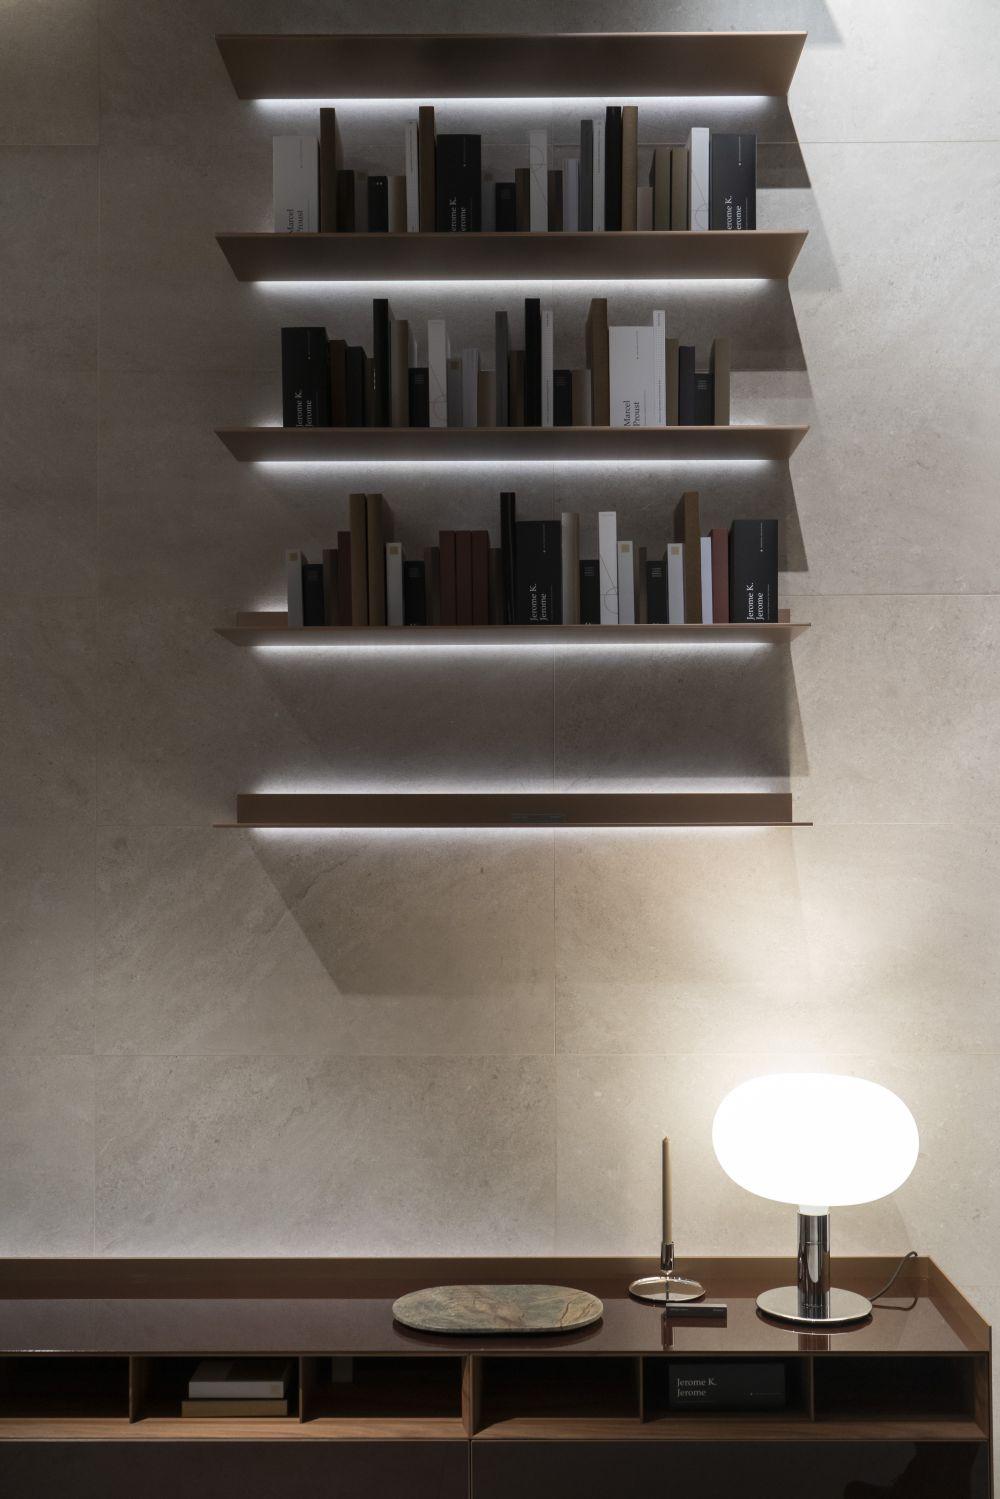 Use Strategic Lighting with Shelves